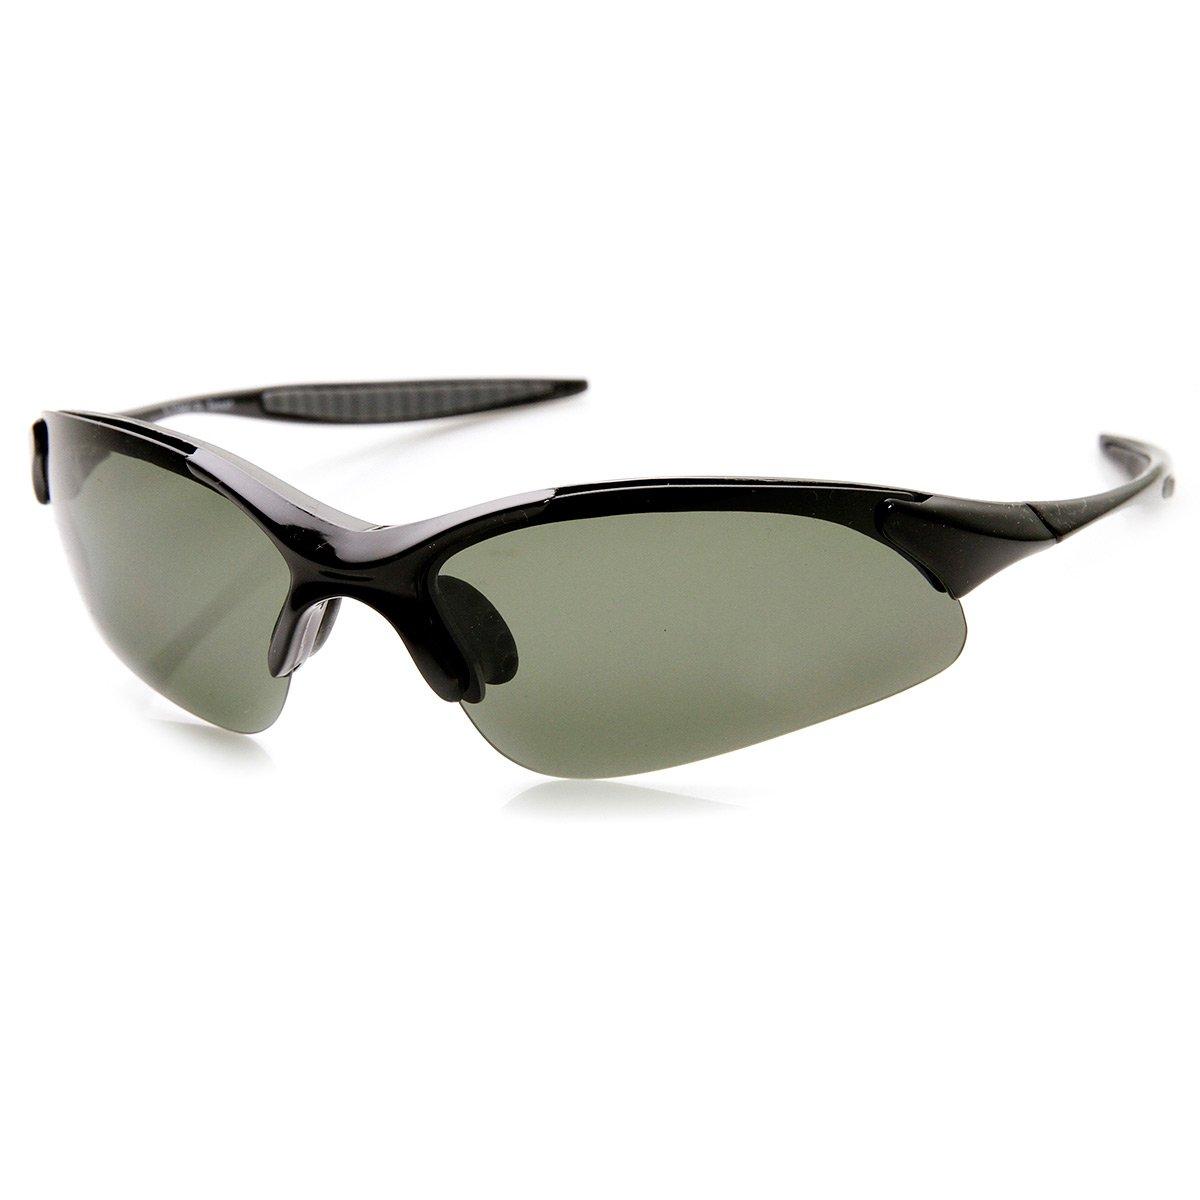 Lightweight Shatterproof TR90 Half Jacket Polarized Lens Sports Sunglasses (Black)